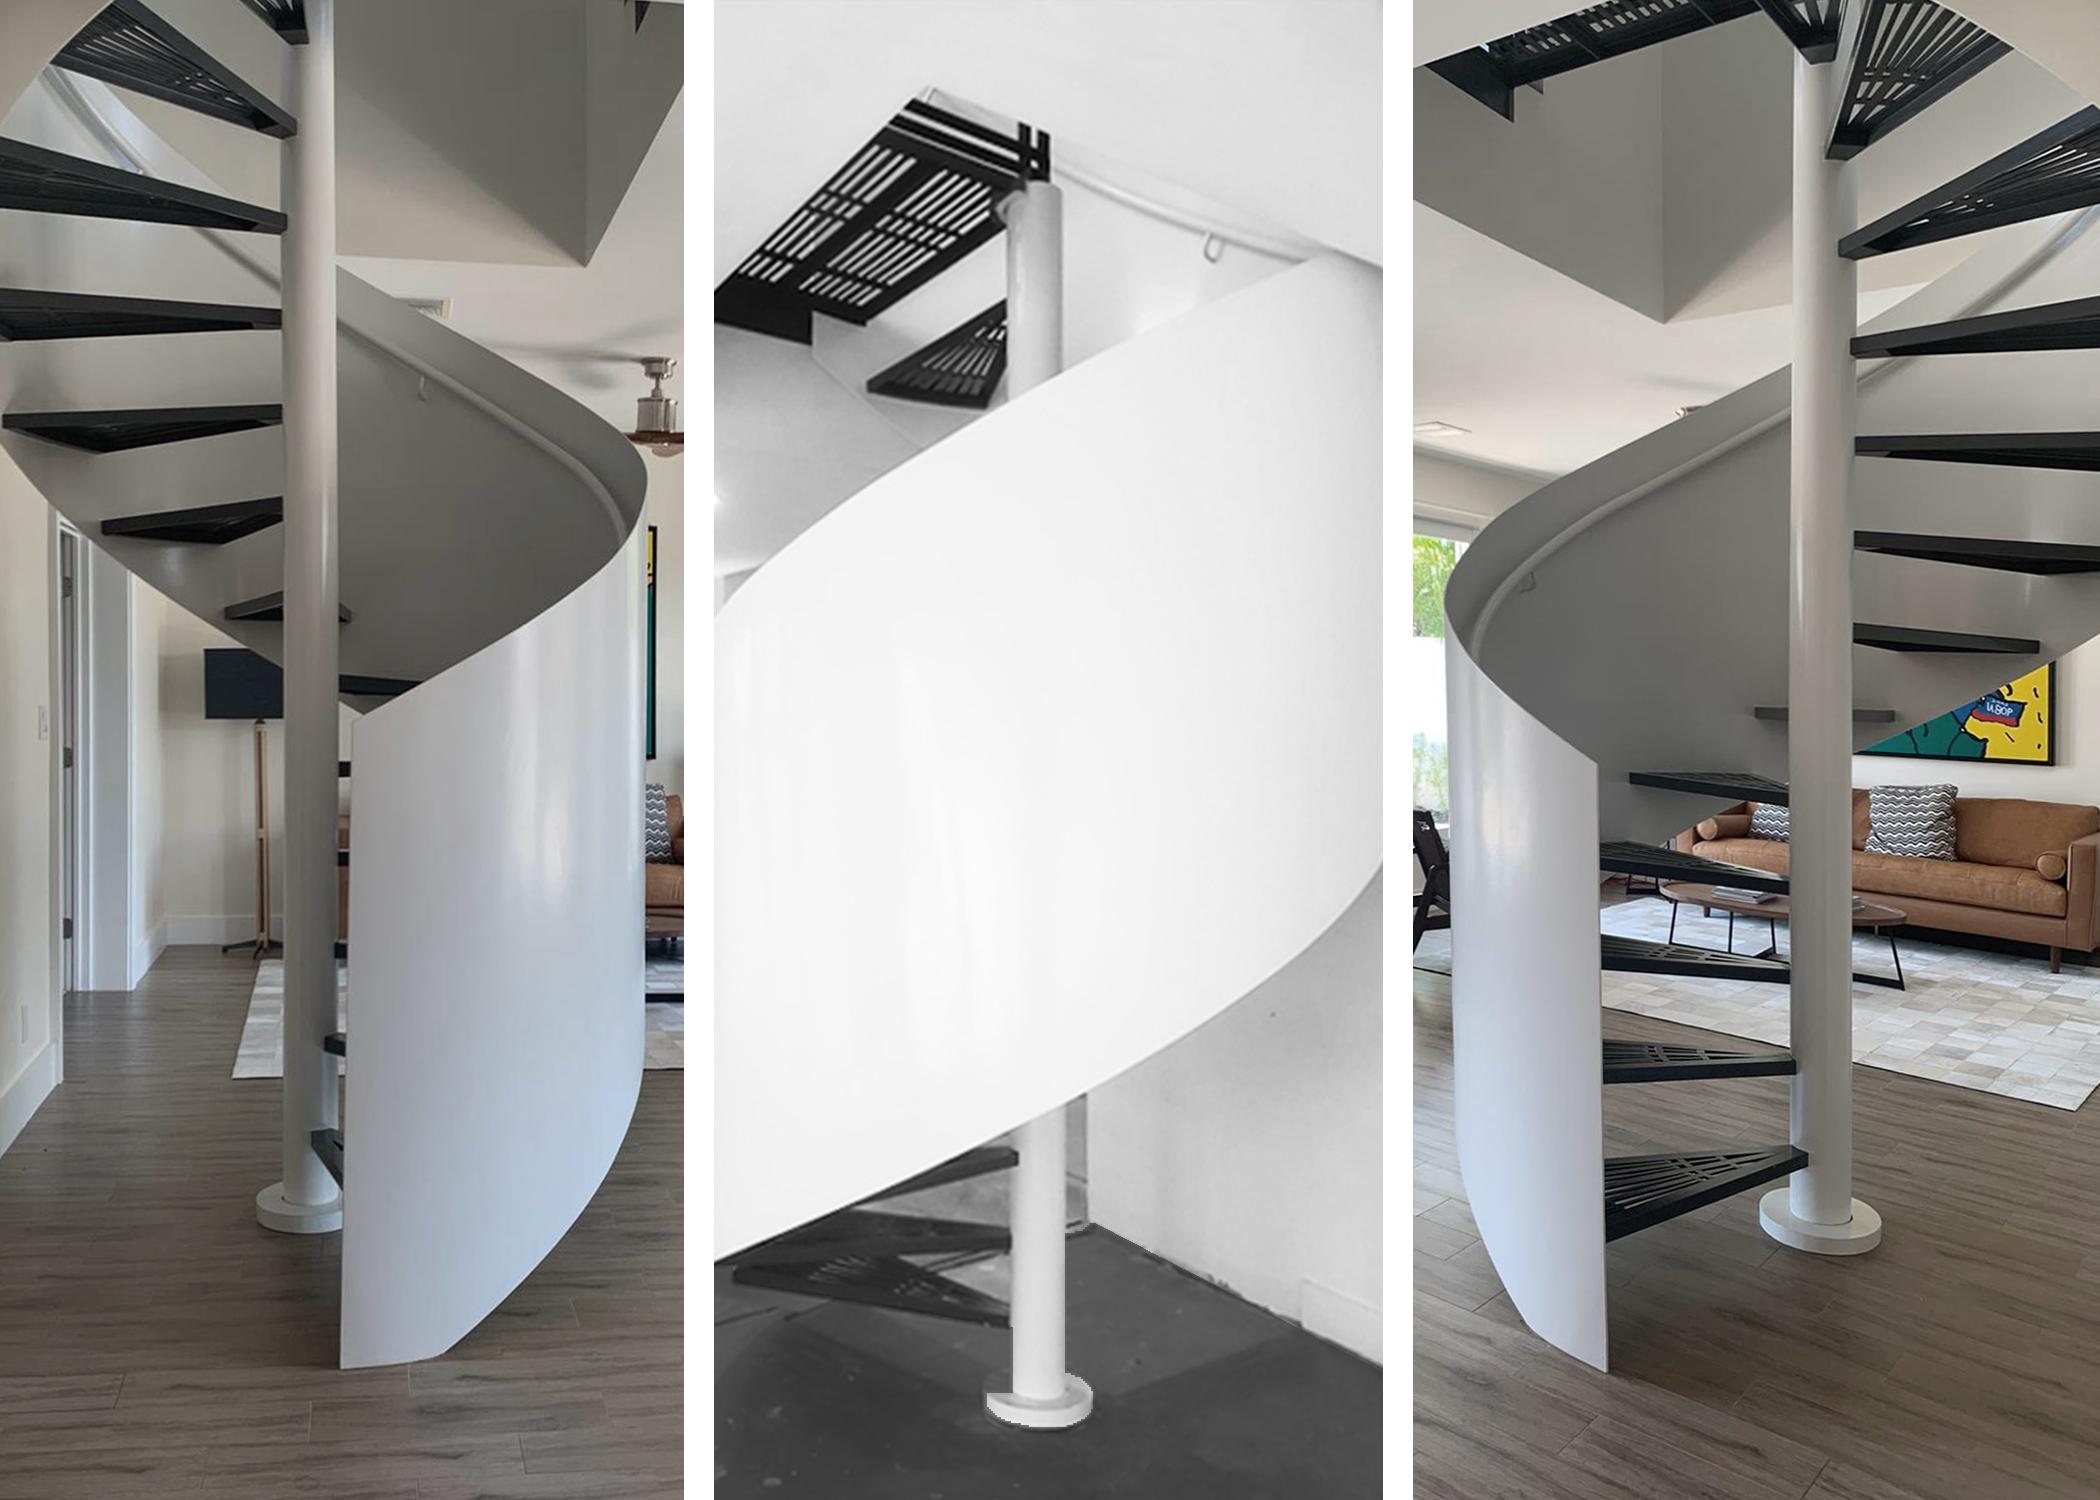 The Spiral Stair Attraction 8 - Belt Atelier